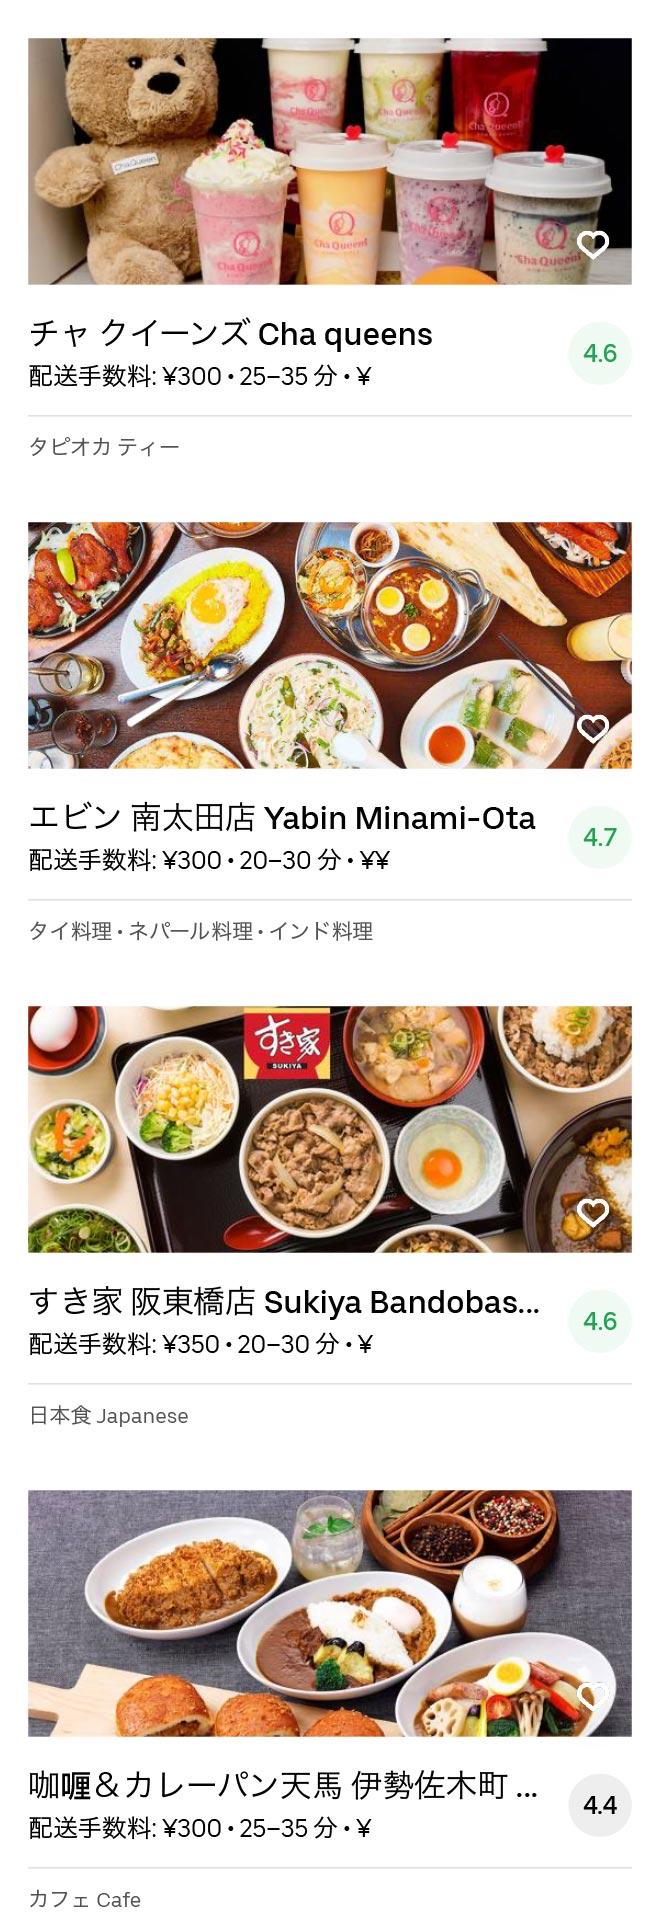 Yokohama negishi menu 2004 12